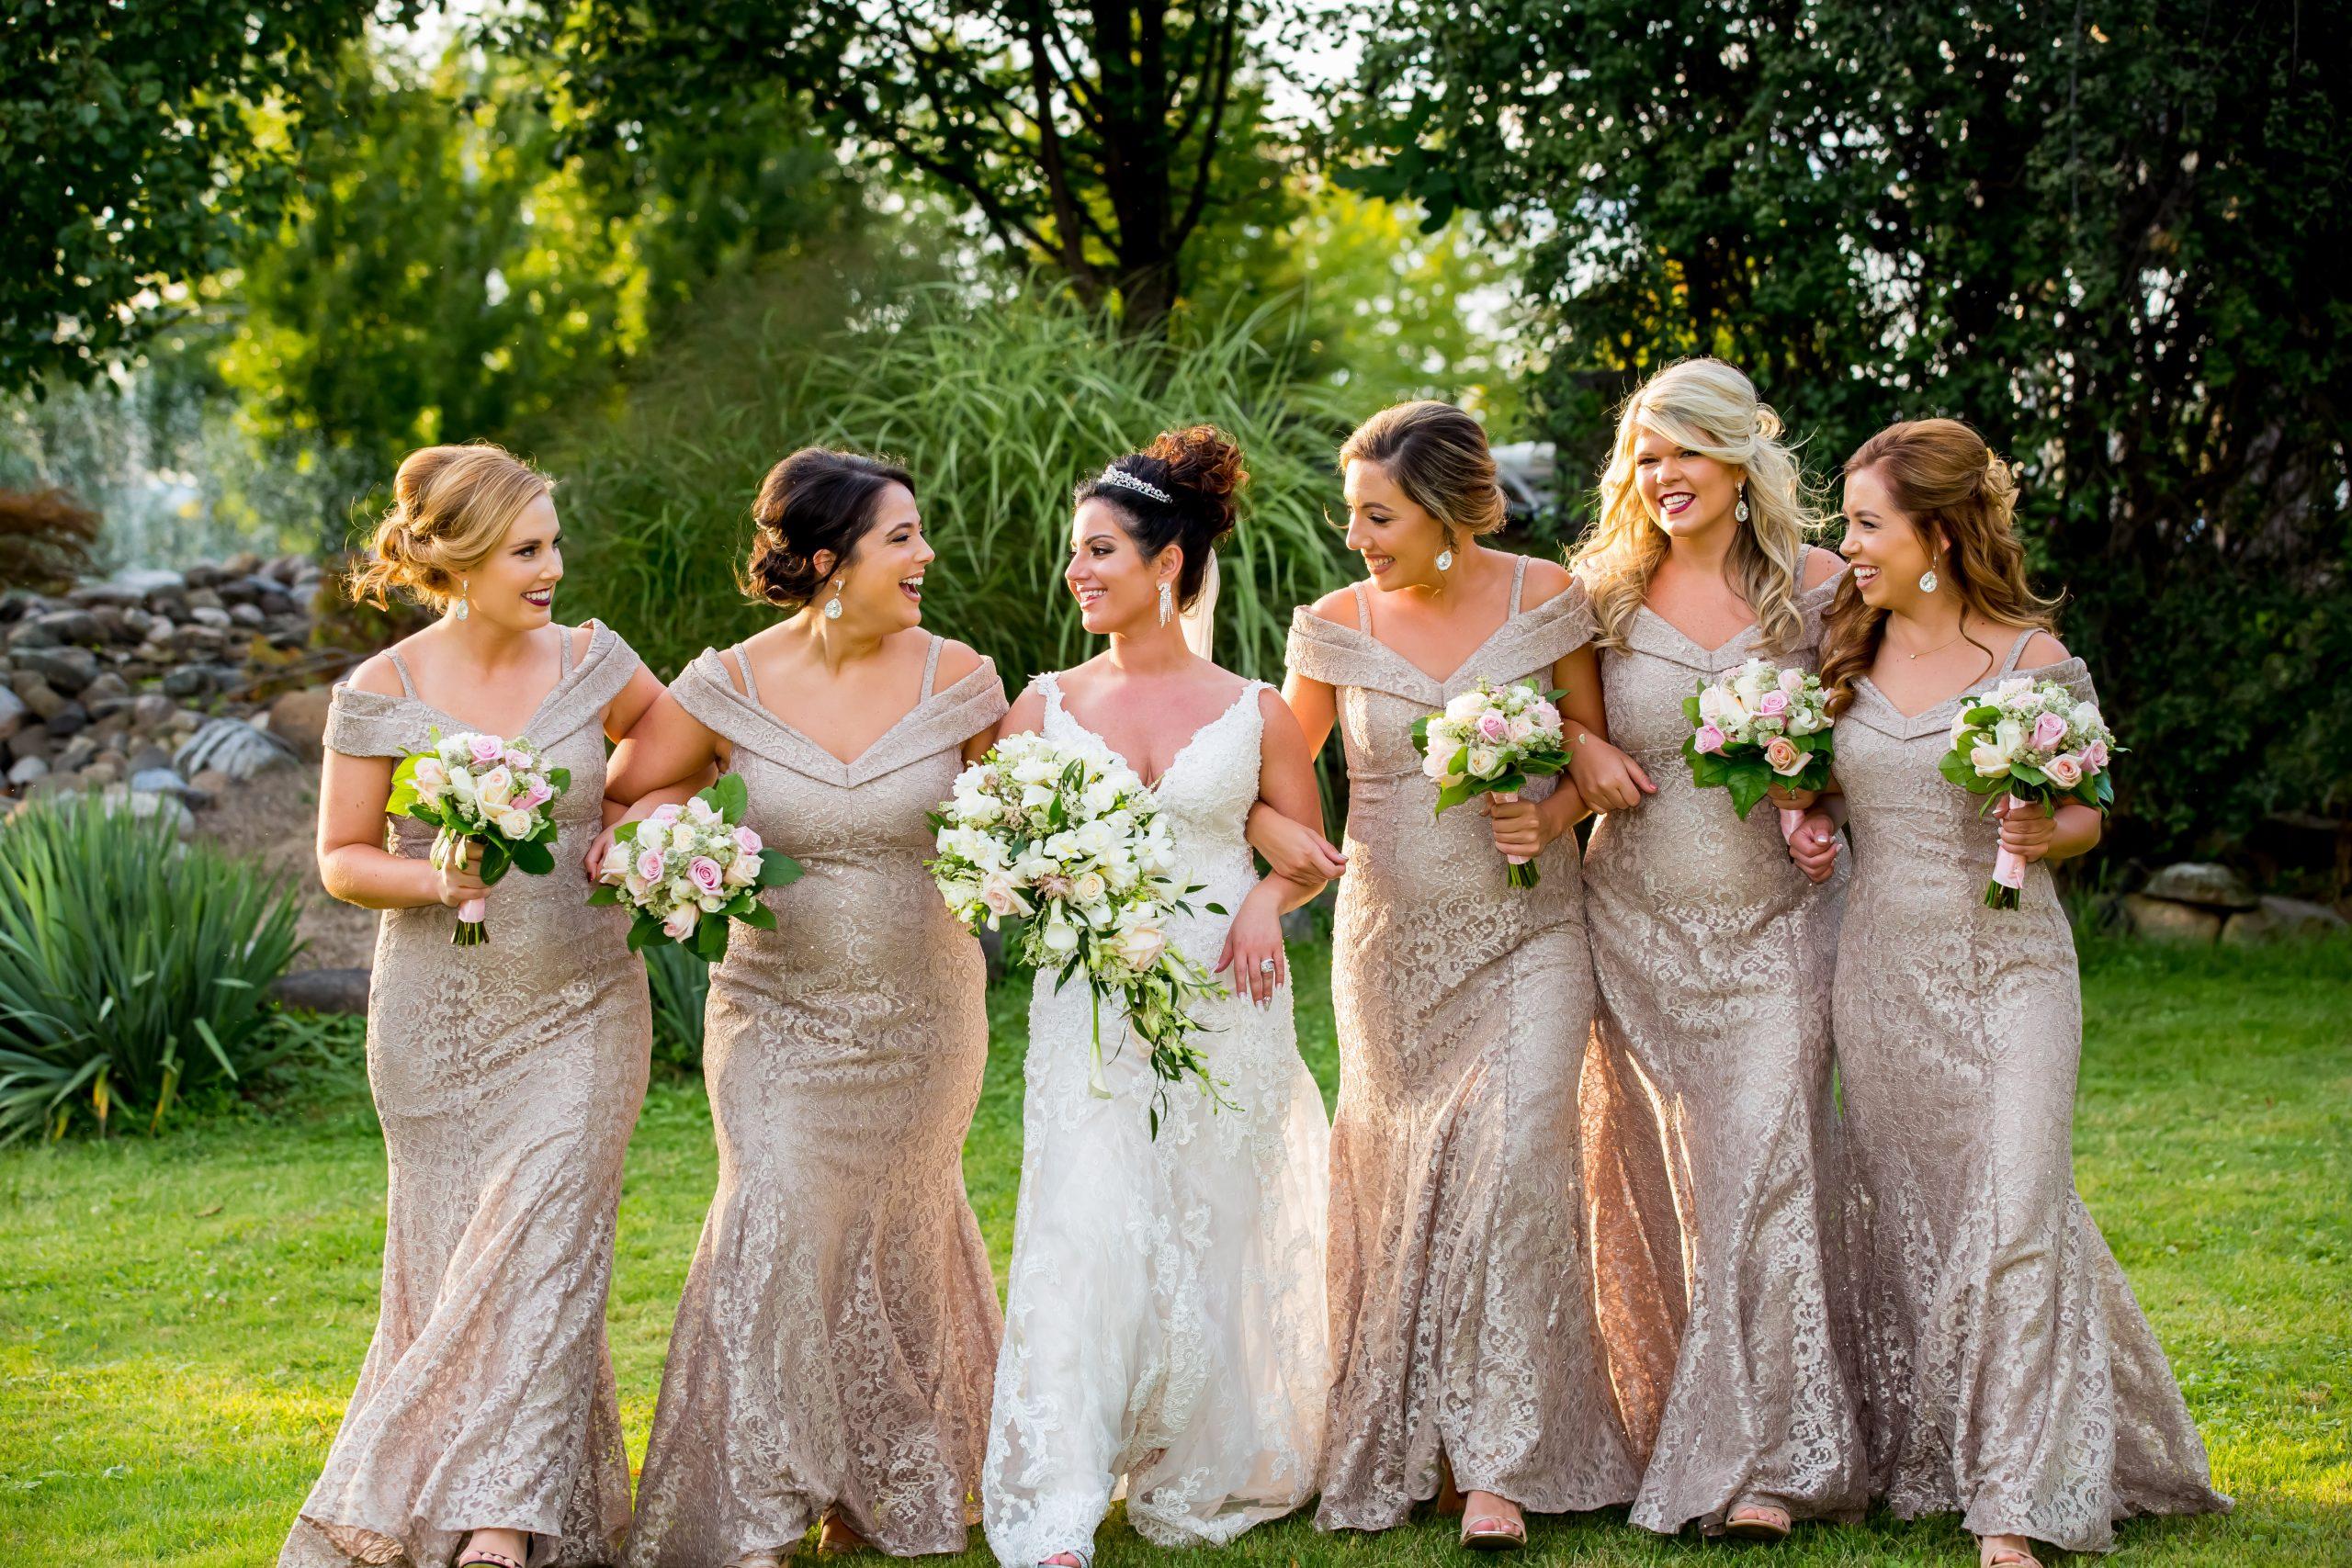 Victori_Rob_Mohawk River Country Club Wedding-35.jpg